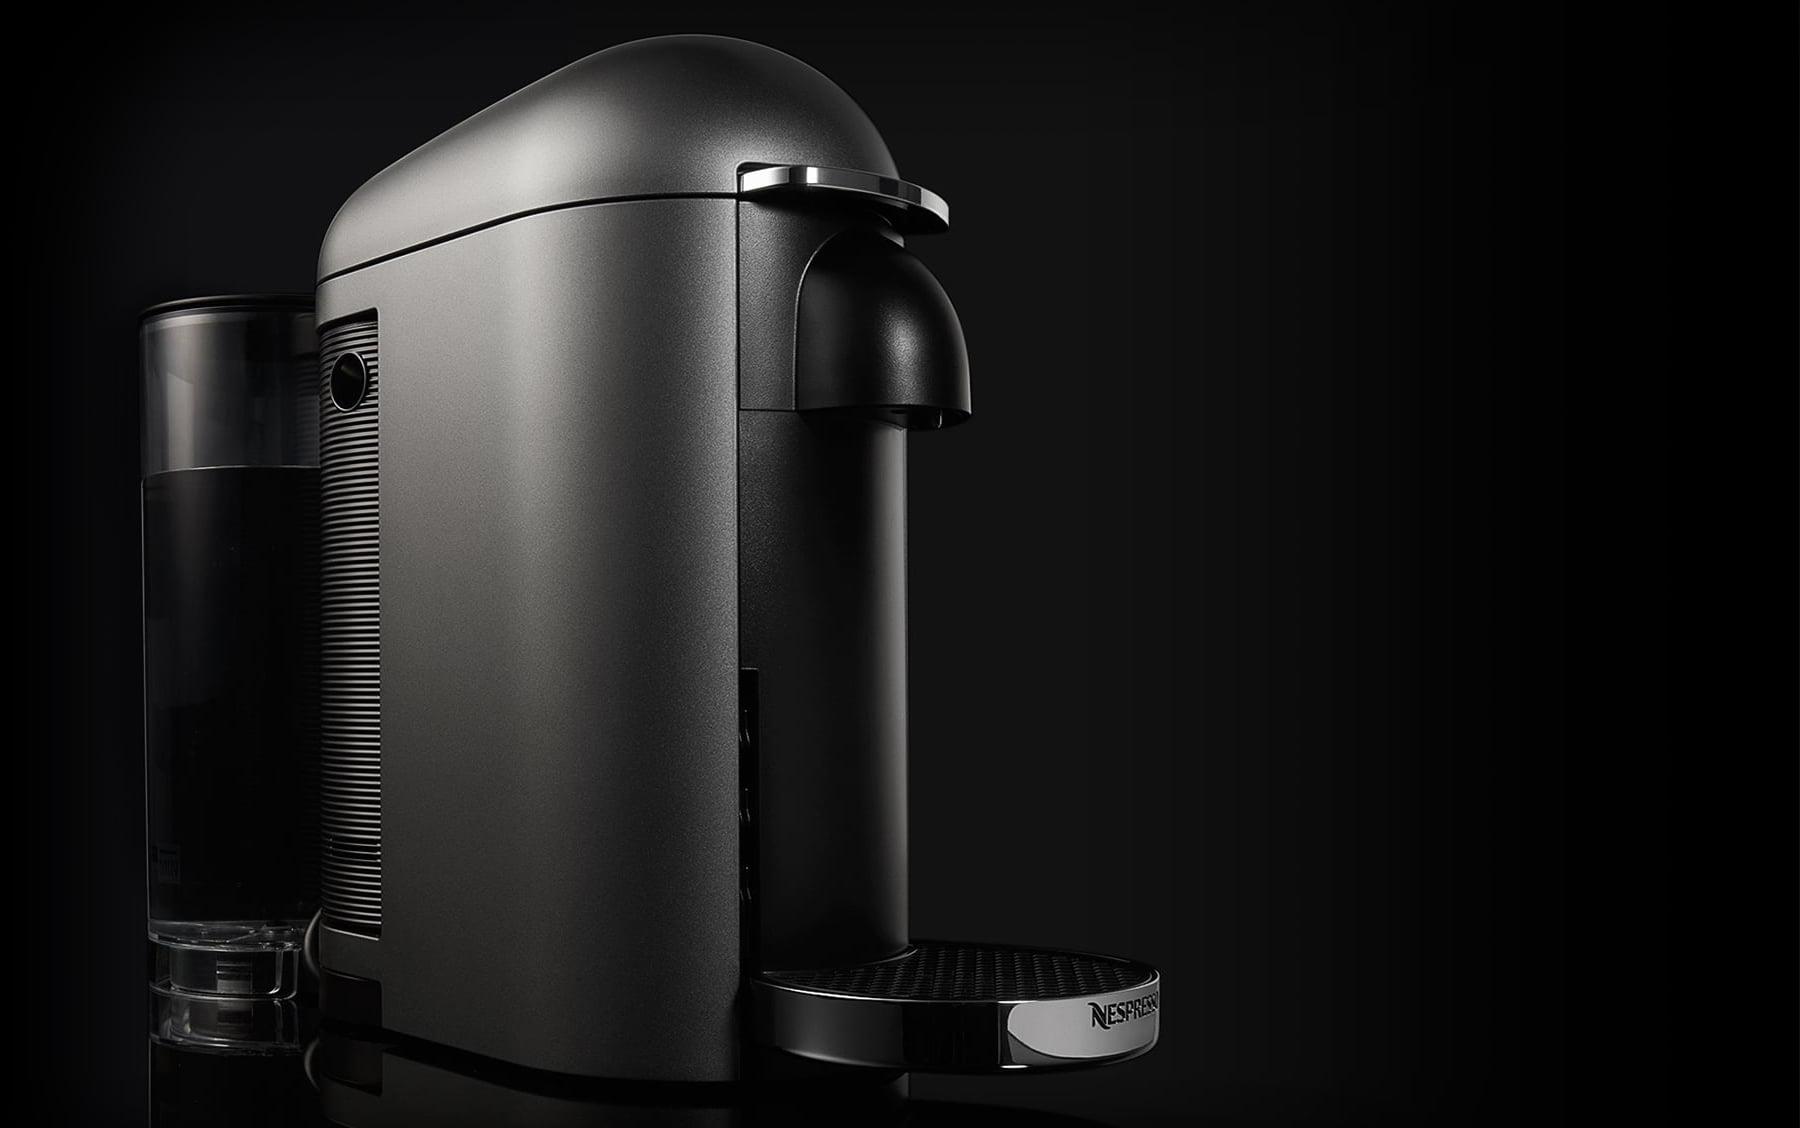 Test de la Nespresso Vertuo : le goût du risque | Geekzone fr